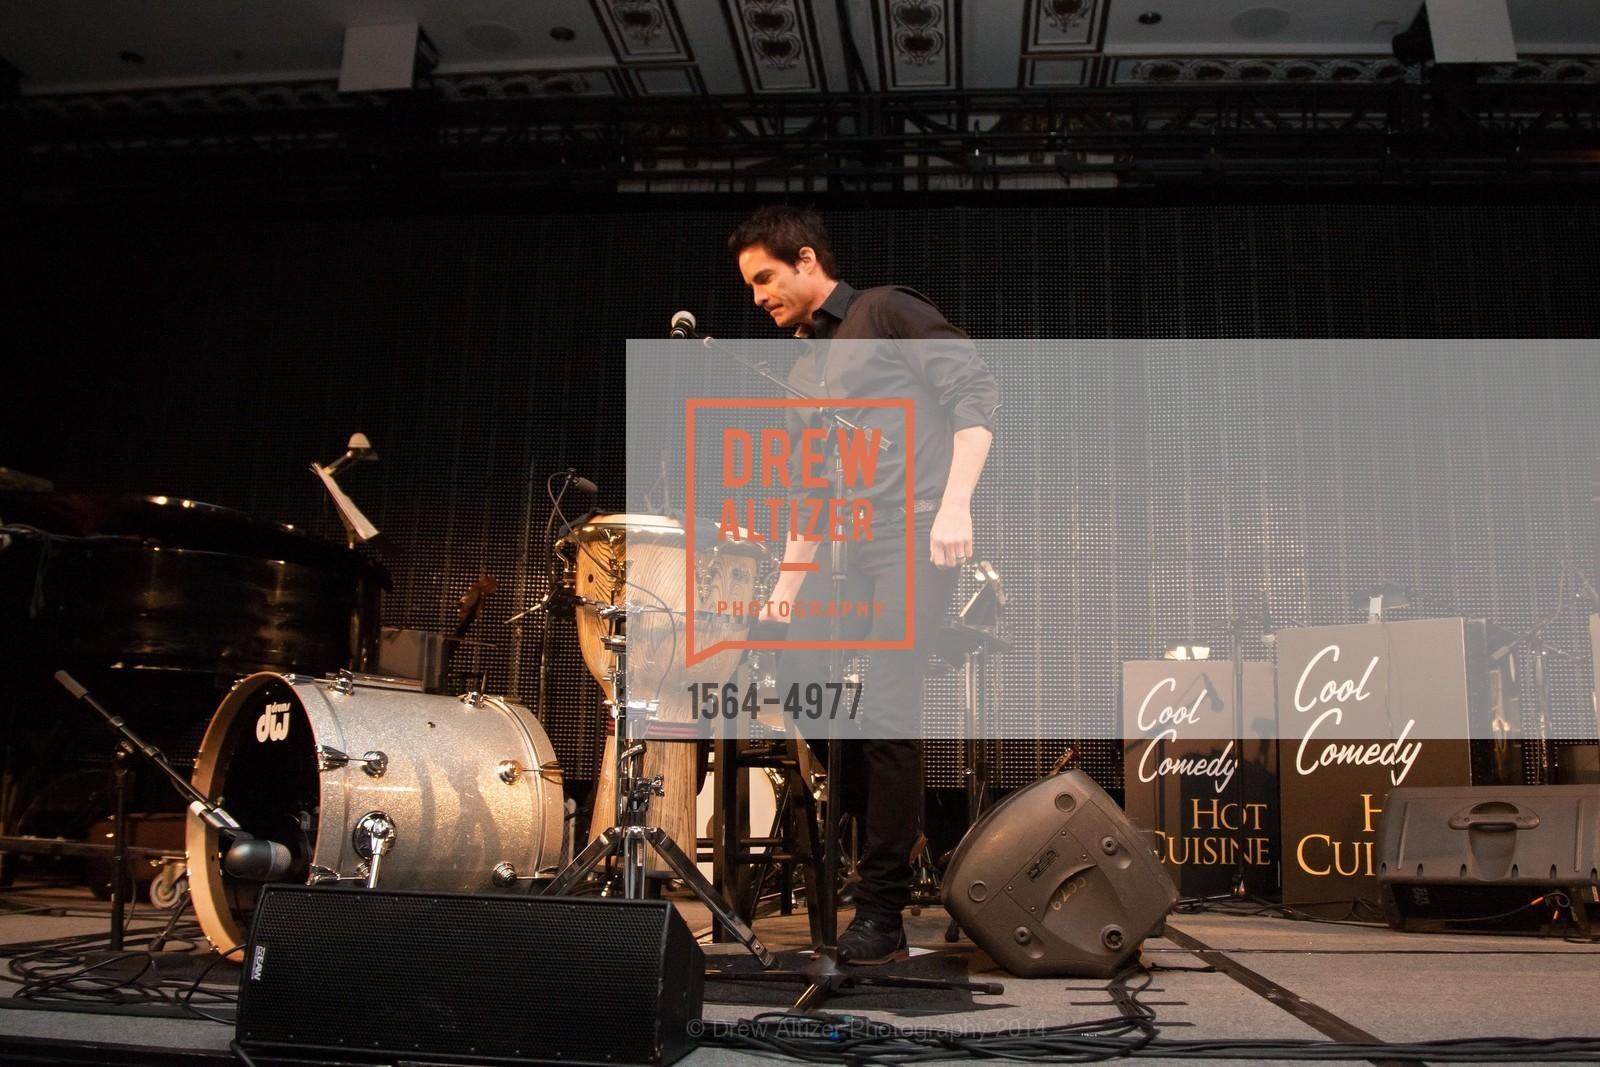 Performance By Pat Monahan (Train), Photo #1564-4977